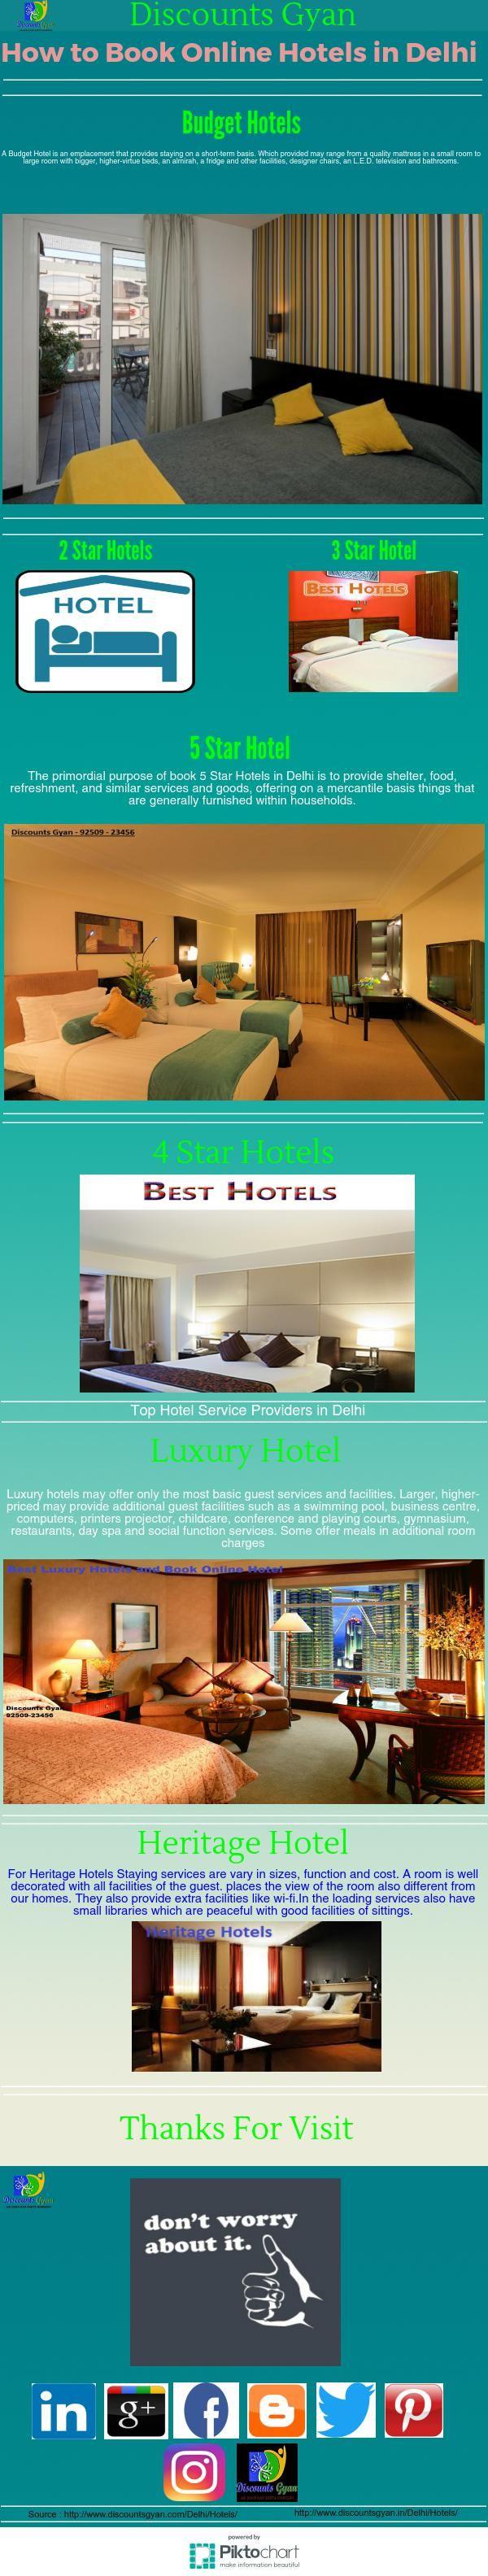 Chelsea plaza hotel dubai dubai book cheap amp discount hotels - How To Book Online Hotels In Delhi Piktochart Infographic